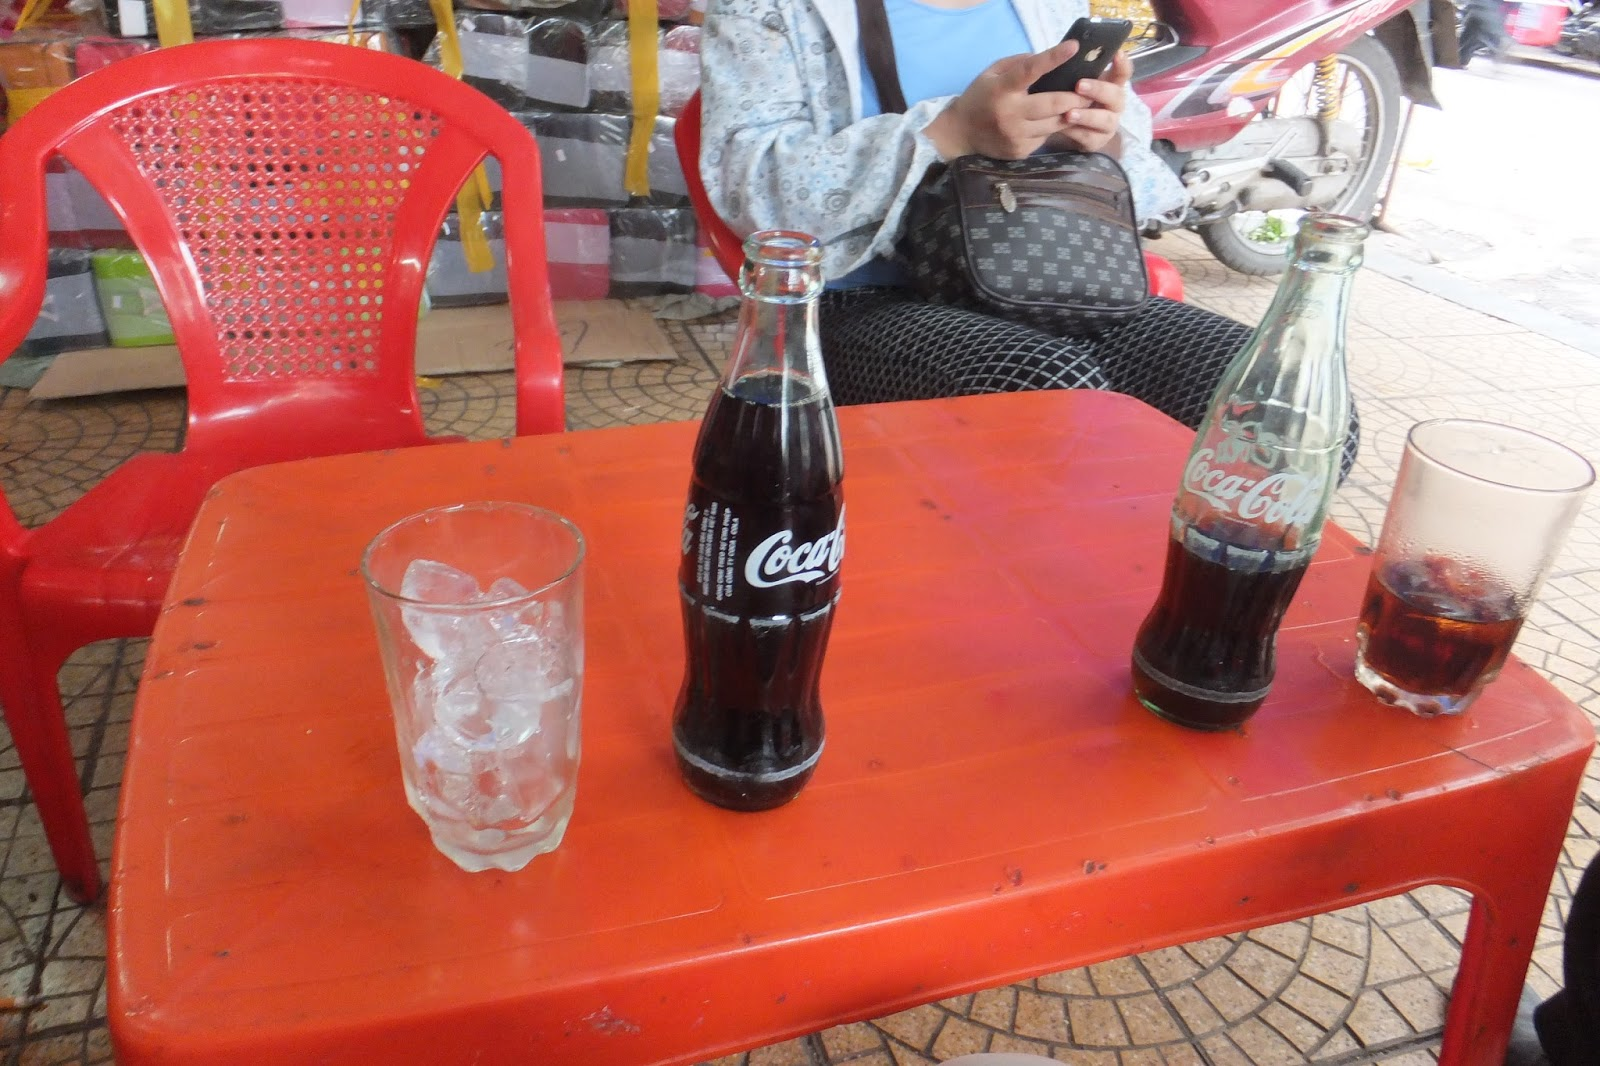 bottle-of-cocacola 瓶のコカコーラ